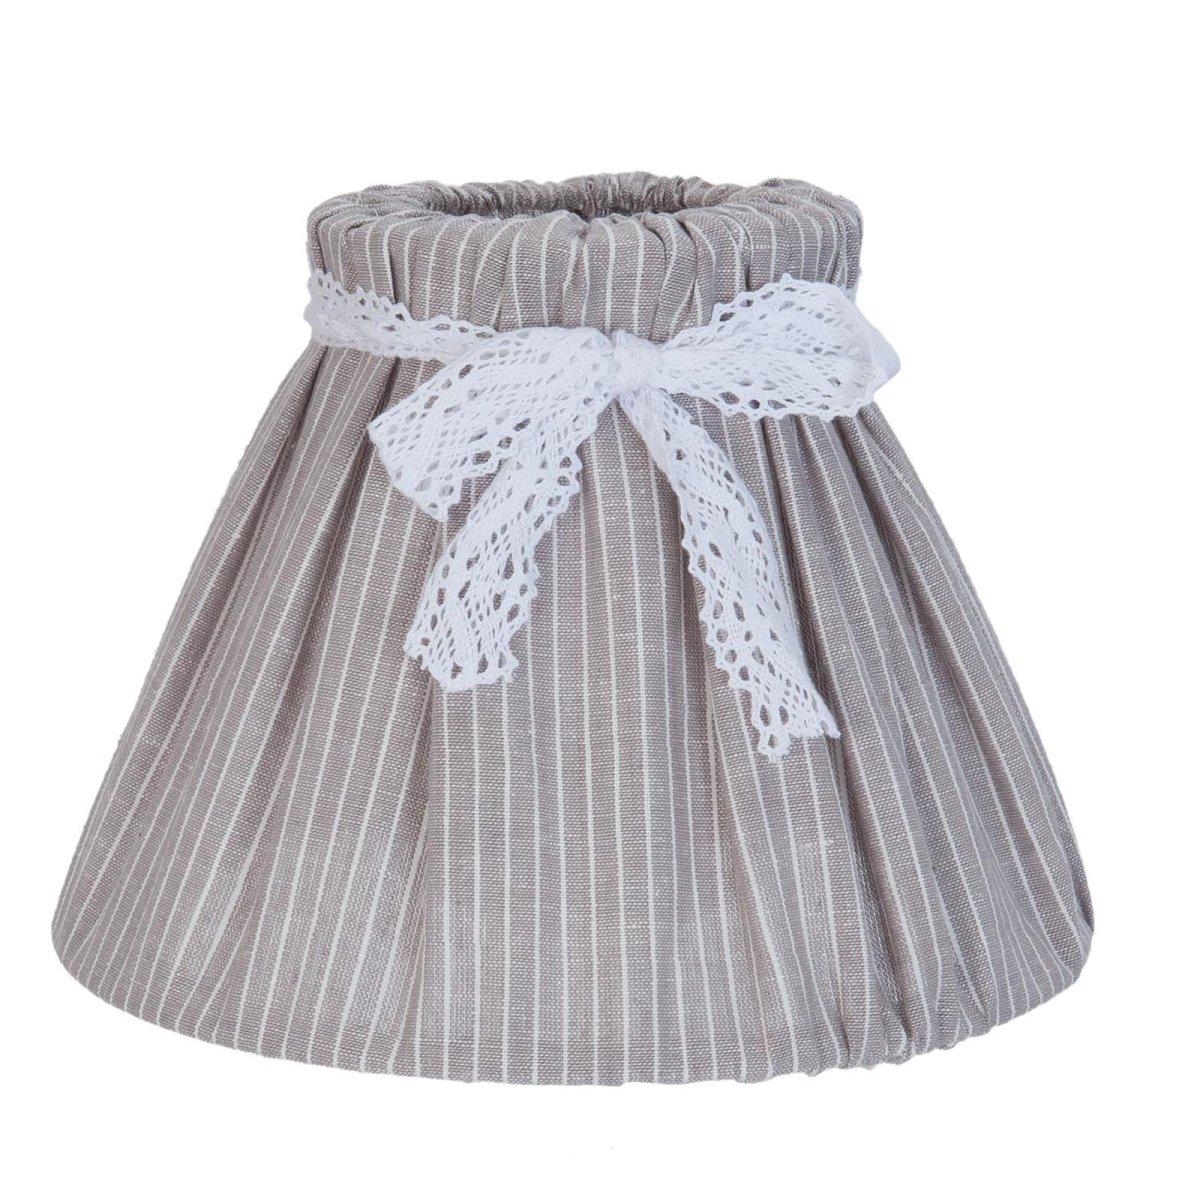 clayre eef lampenschirm landhaus f r stehlampe schleife grau stoff 16 90. Black Bedroom Furniture Sets. Home Design Ideas